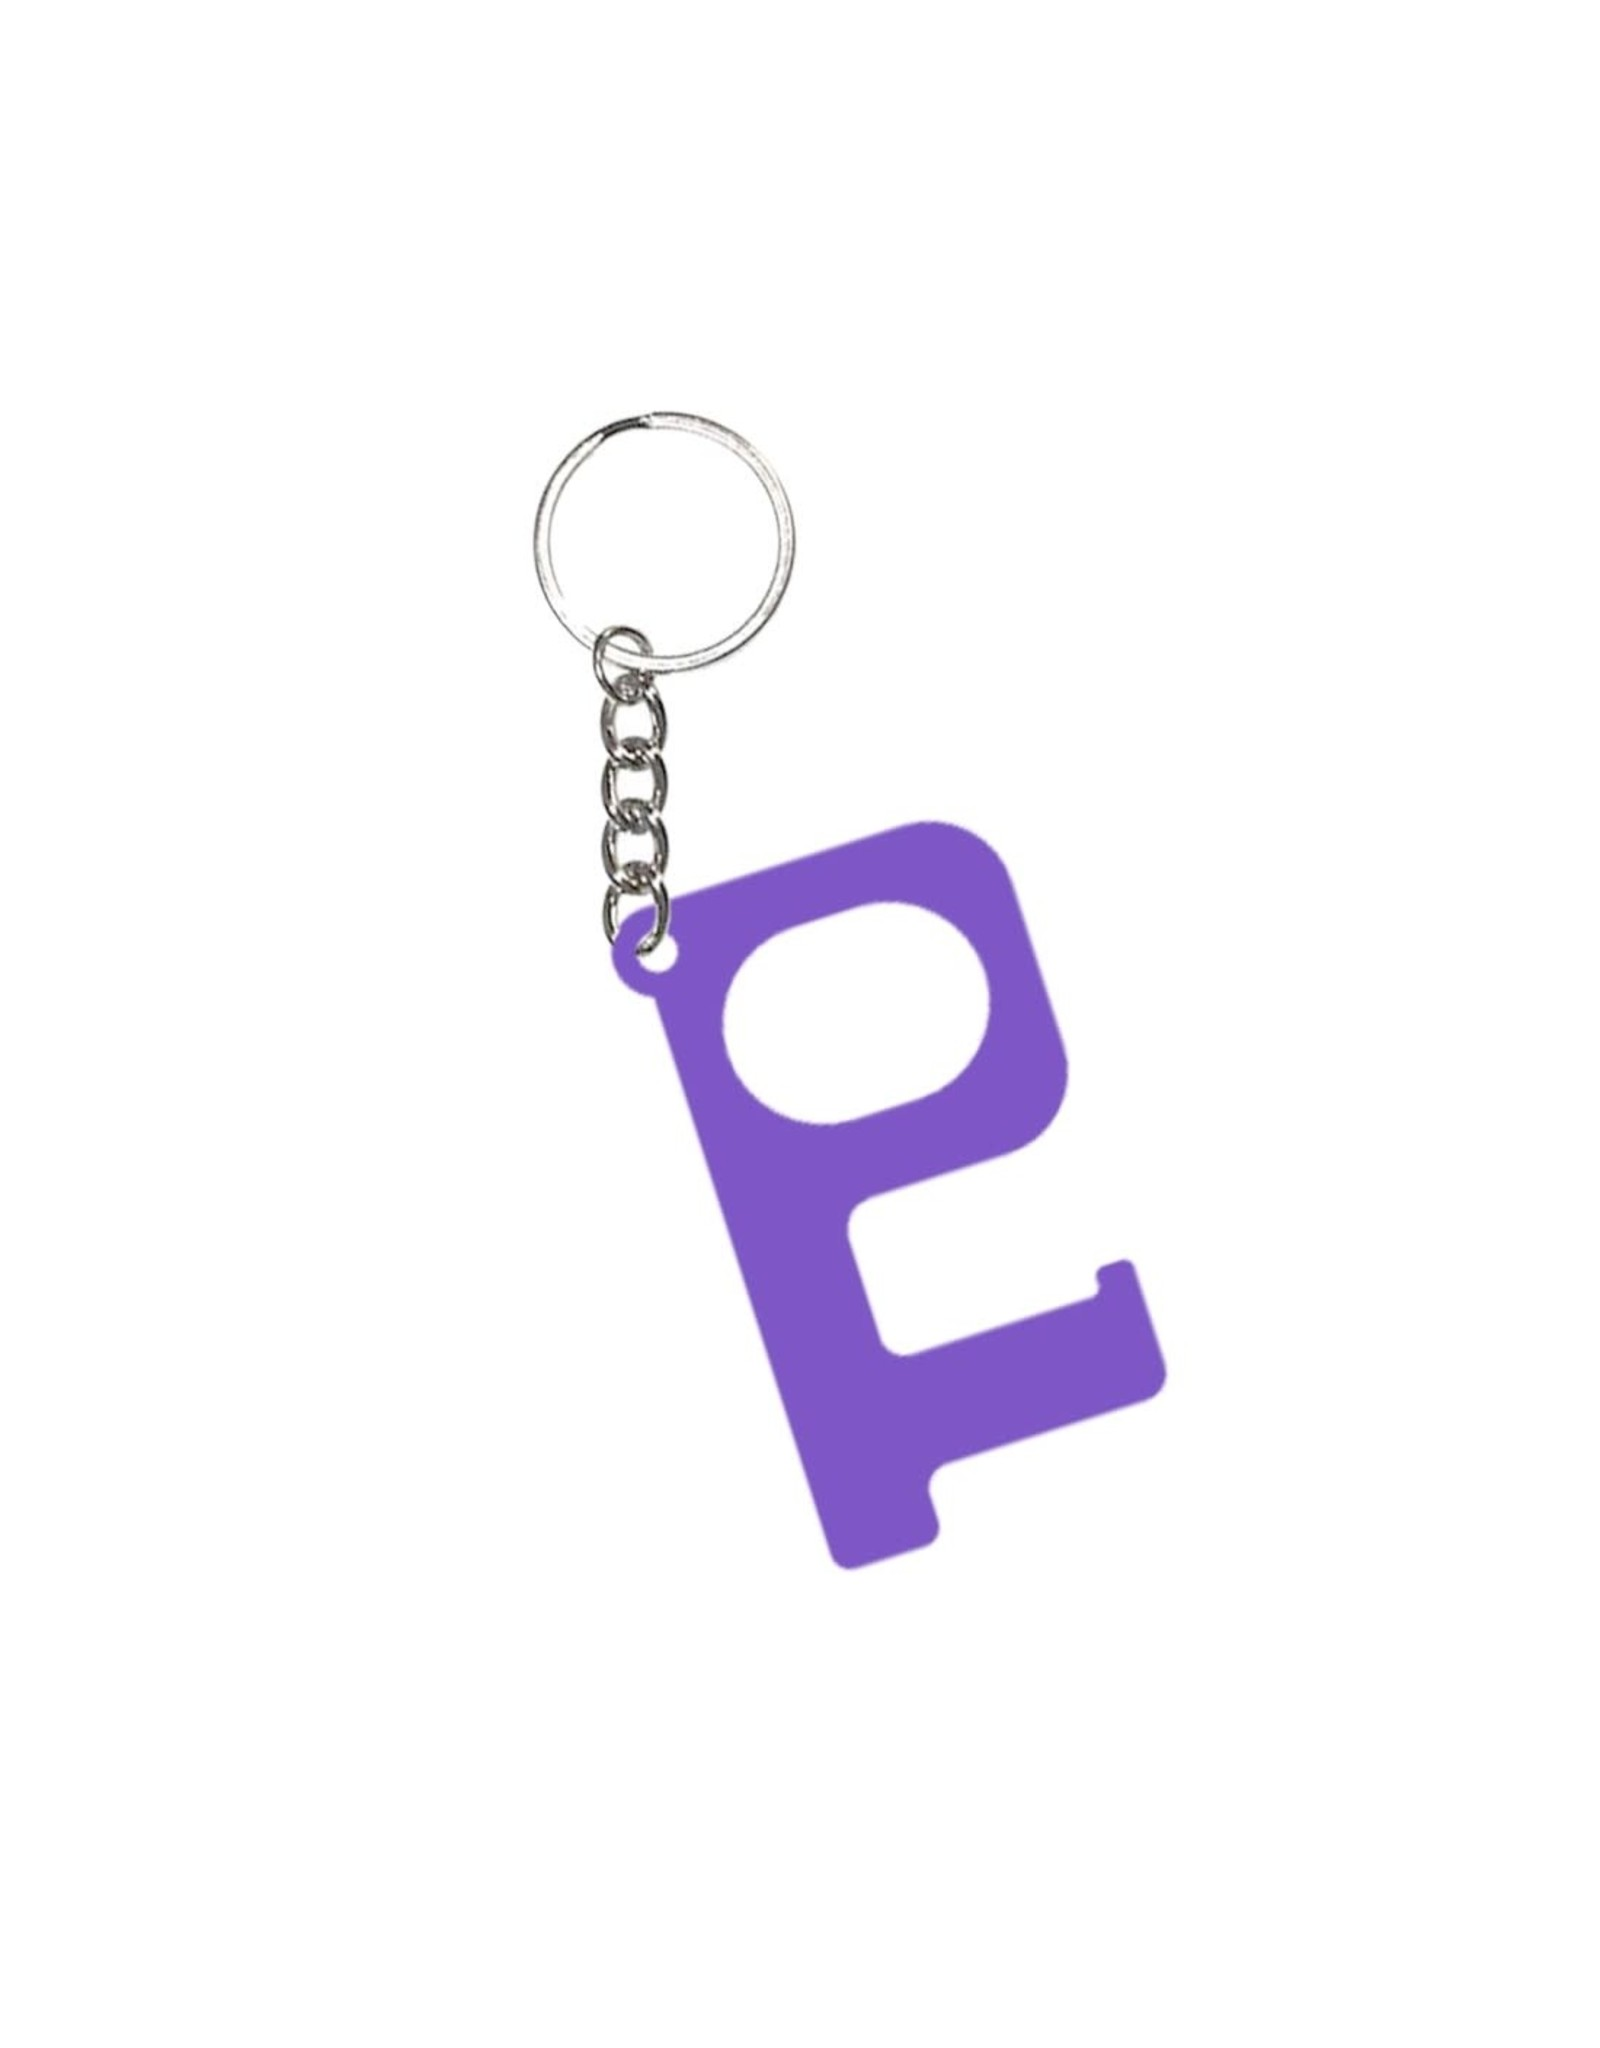 Acrylic Door Key, Purple